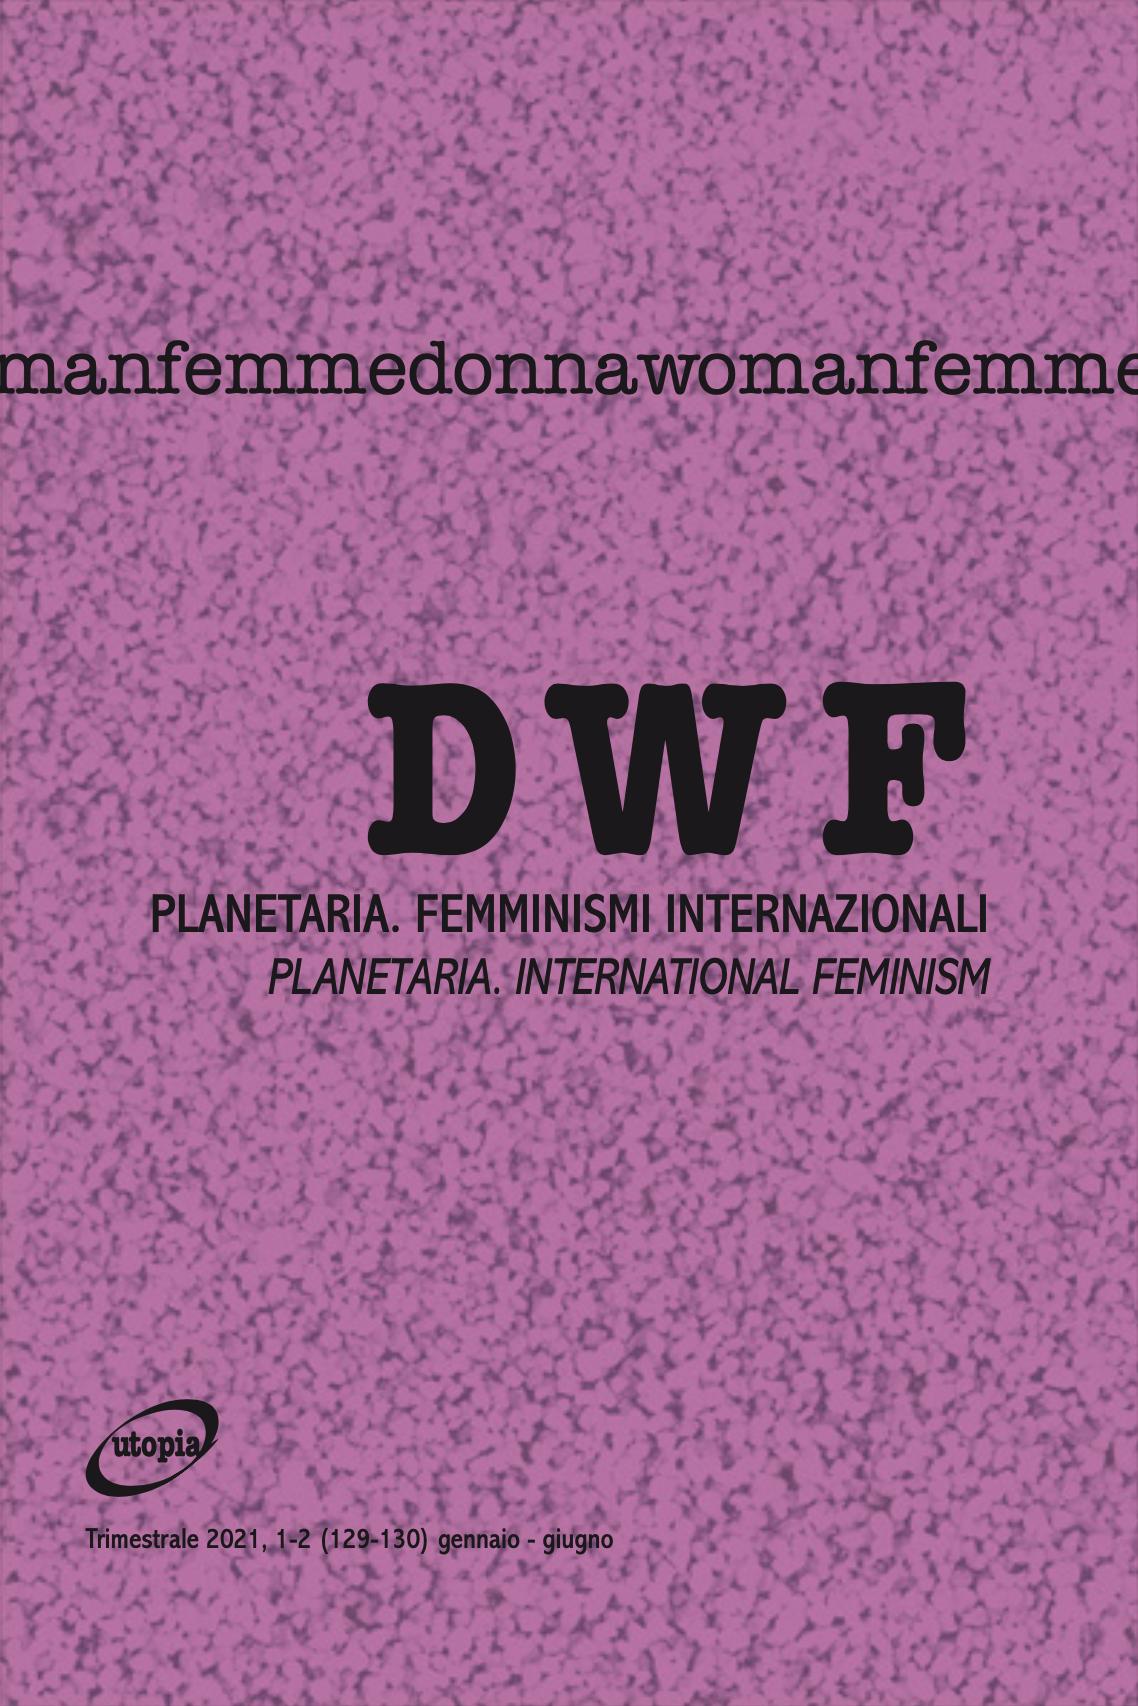 PLANETARIA. Femminismi internazionali/PLANETARIA. International feminisms, DWF (129-130) 2021, 1-2